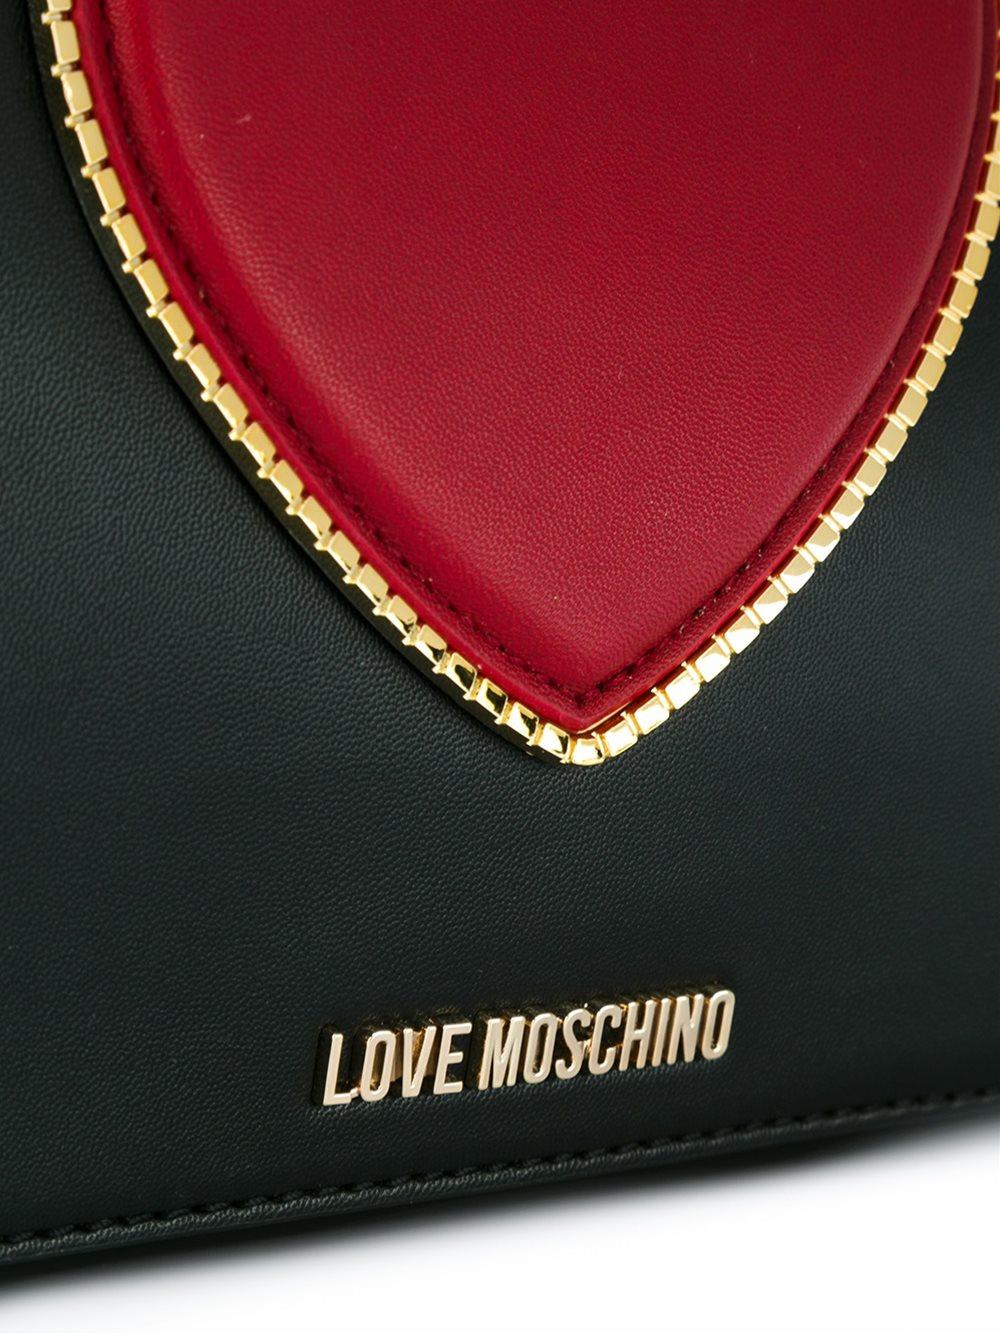 Love Moschino Heart Crossbody Bag in Black